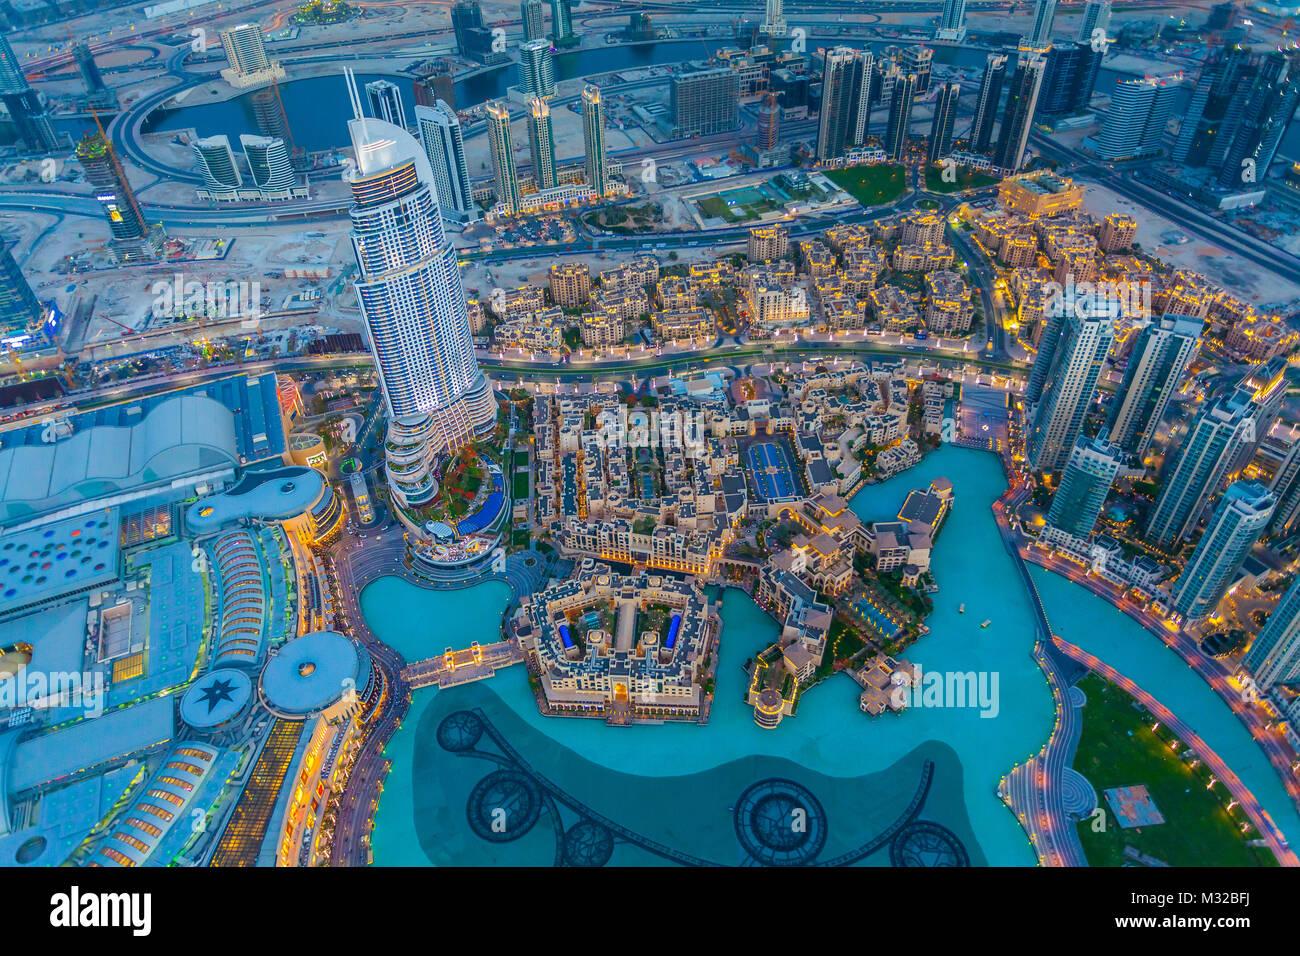 Luftaufnahme von Downtown Dubai am Sonnenuntergang Stockbild